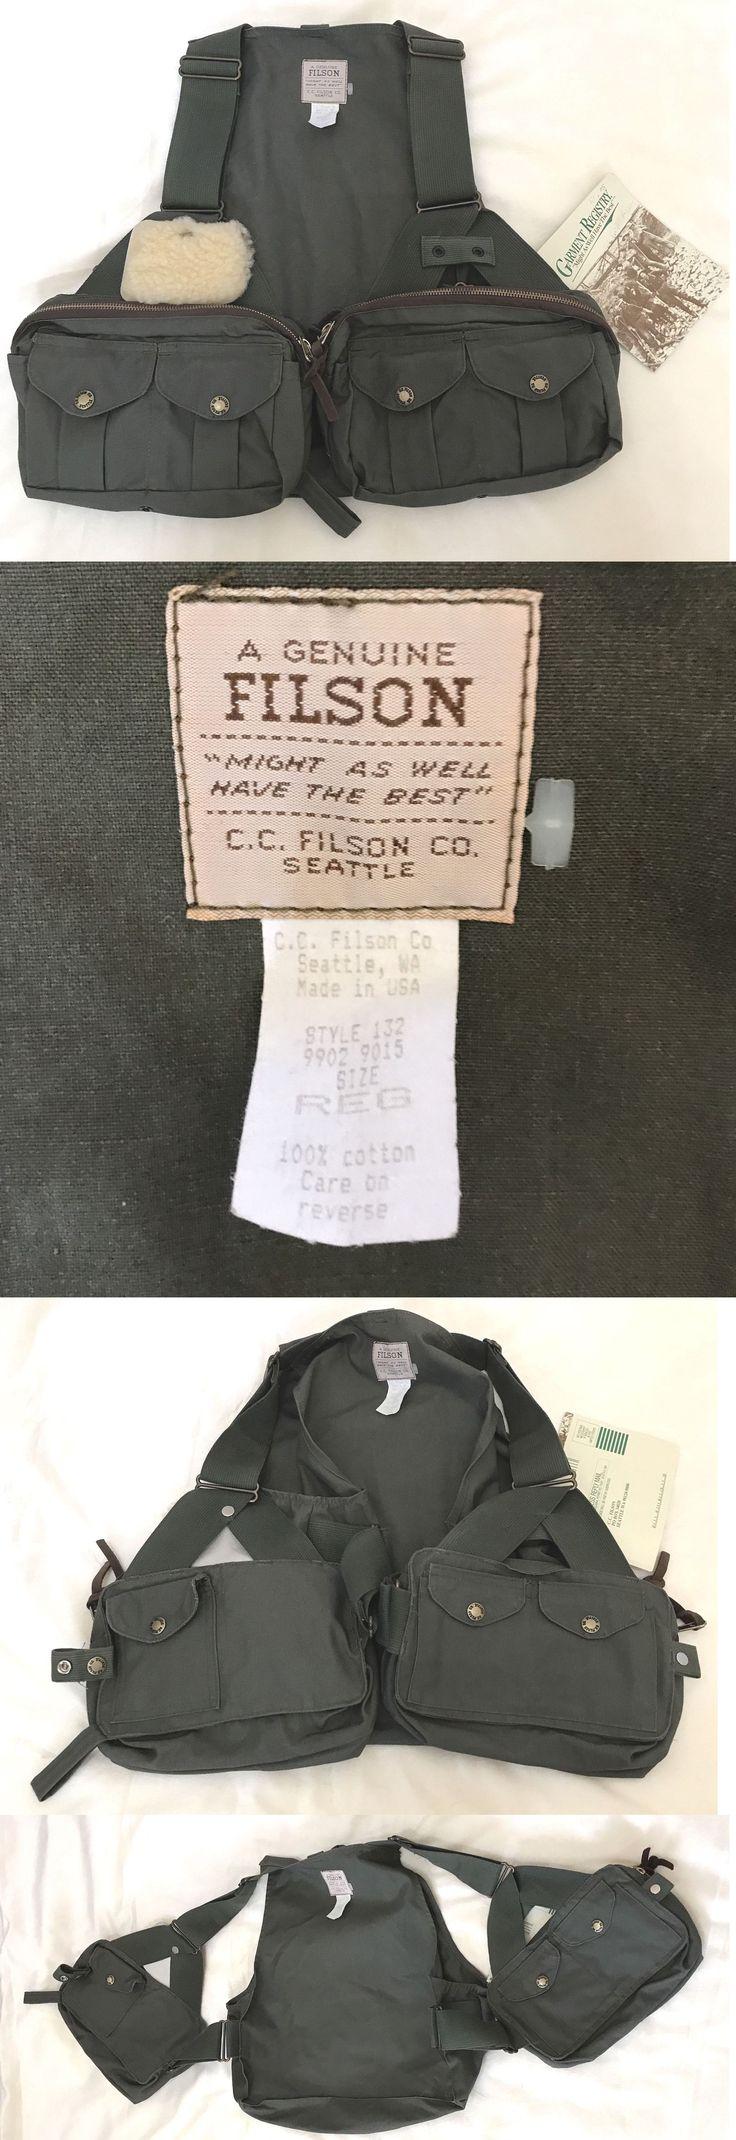 Vests 65982: C. C. Filson Style 132 Fly Fishing Vest Size Reg Regular * New W Tag -> BUY IT NOW ONLY: $215 on eBay!